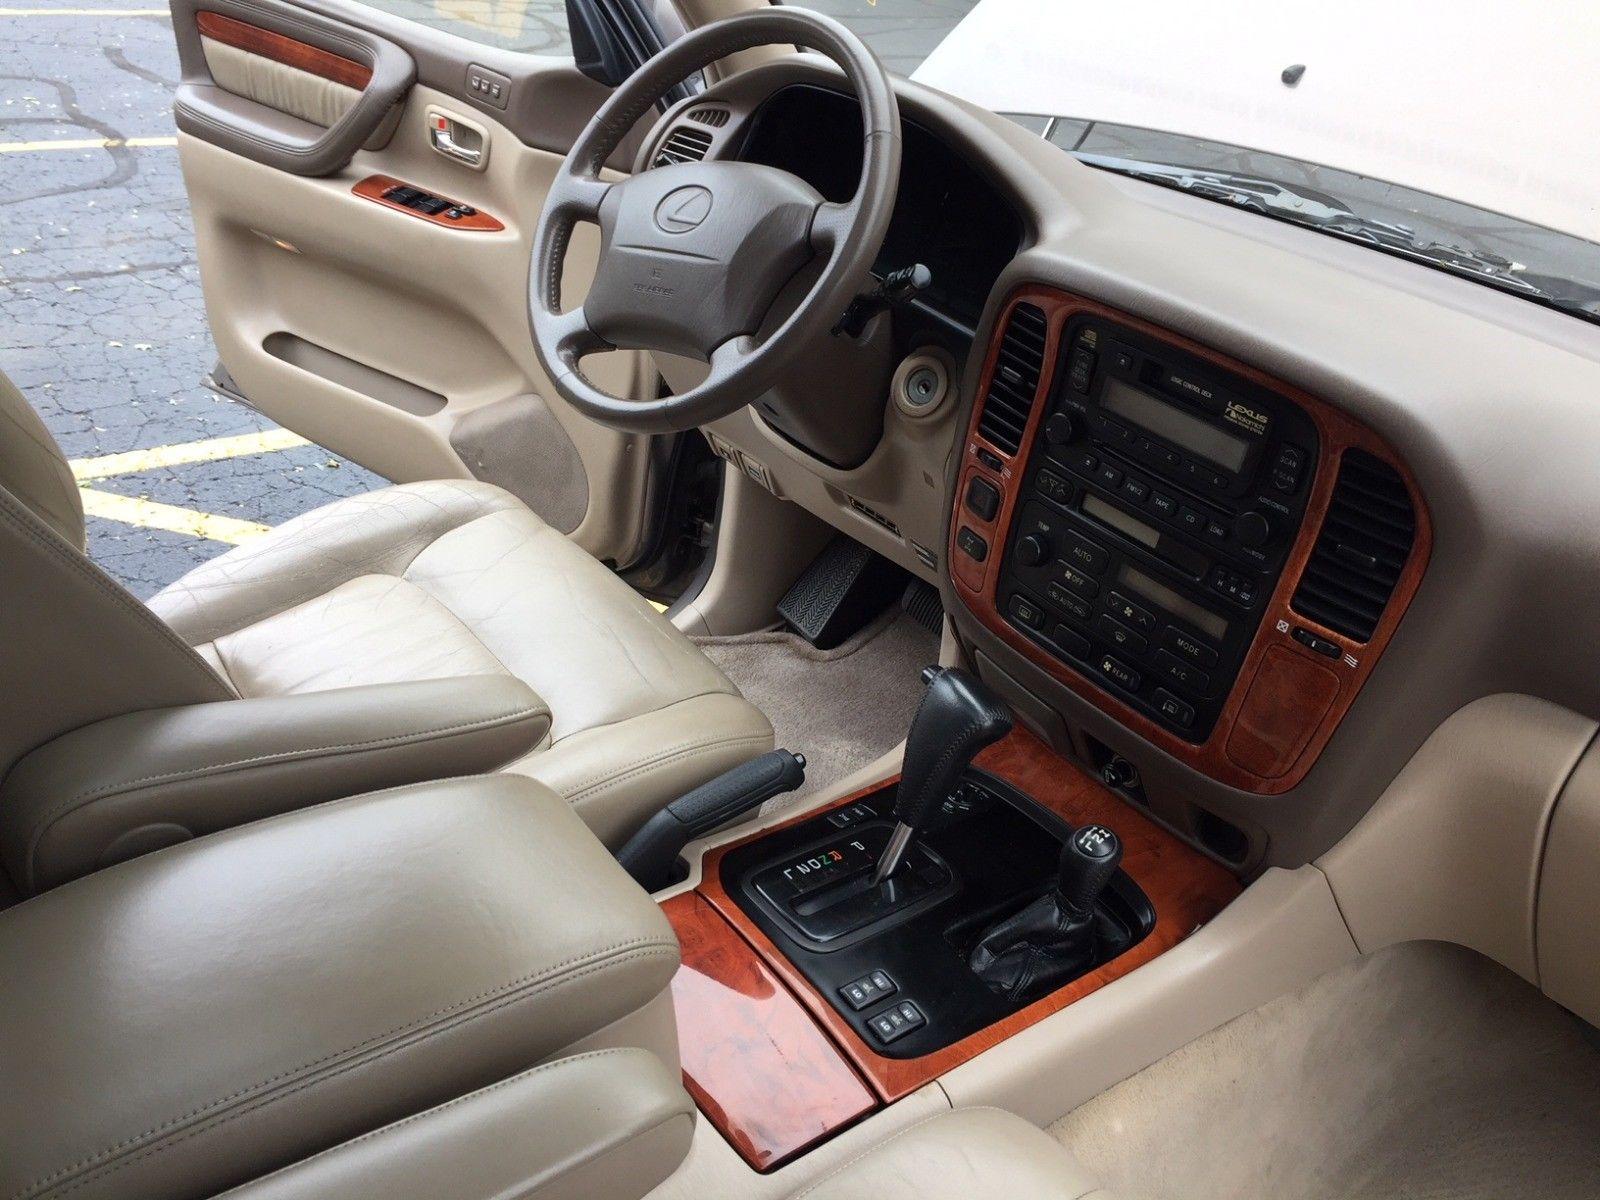 1999 lexus ls lx470 1999 lexus lx 470 4 4 luxury suv rear jump seats 7 pass toyota dependability 2018 2019 mycarboard com mycarboard com